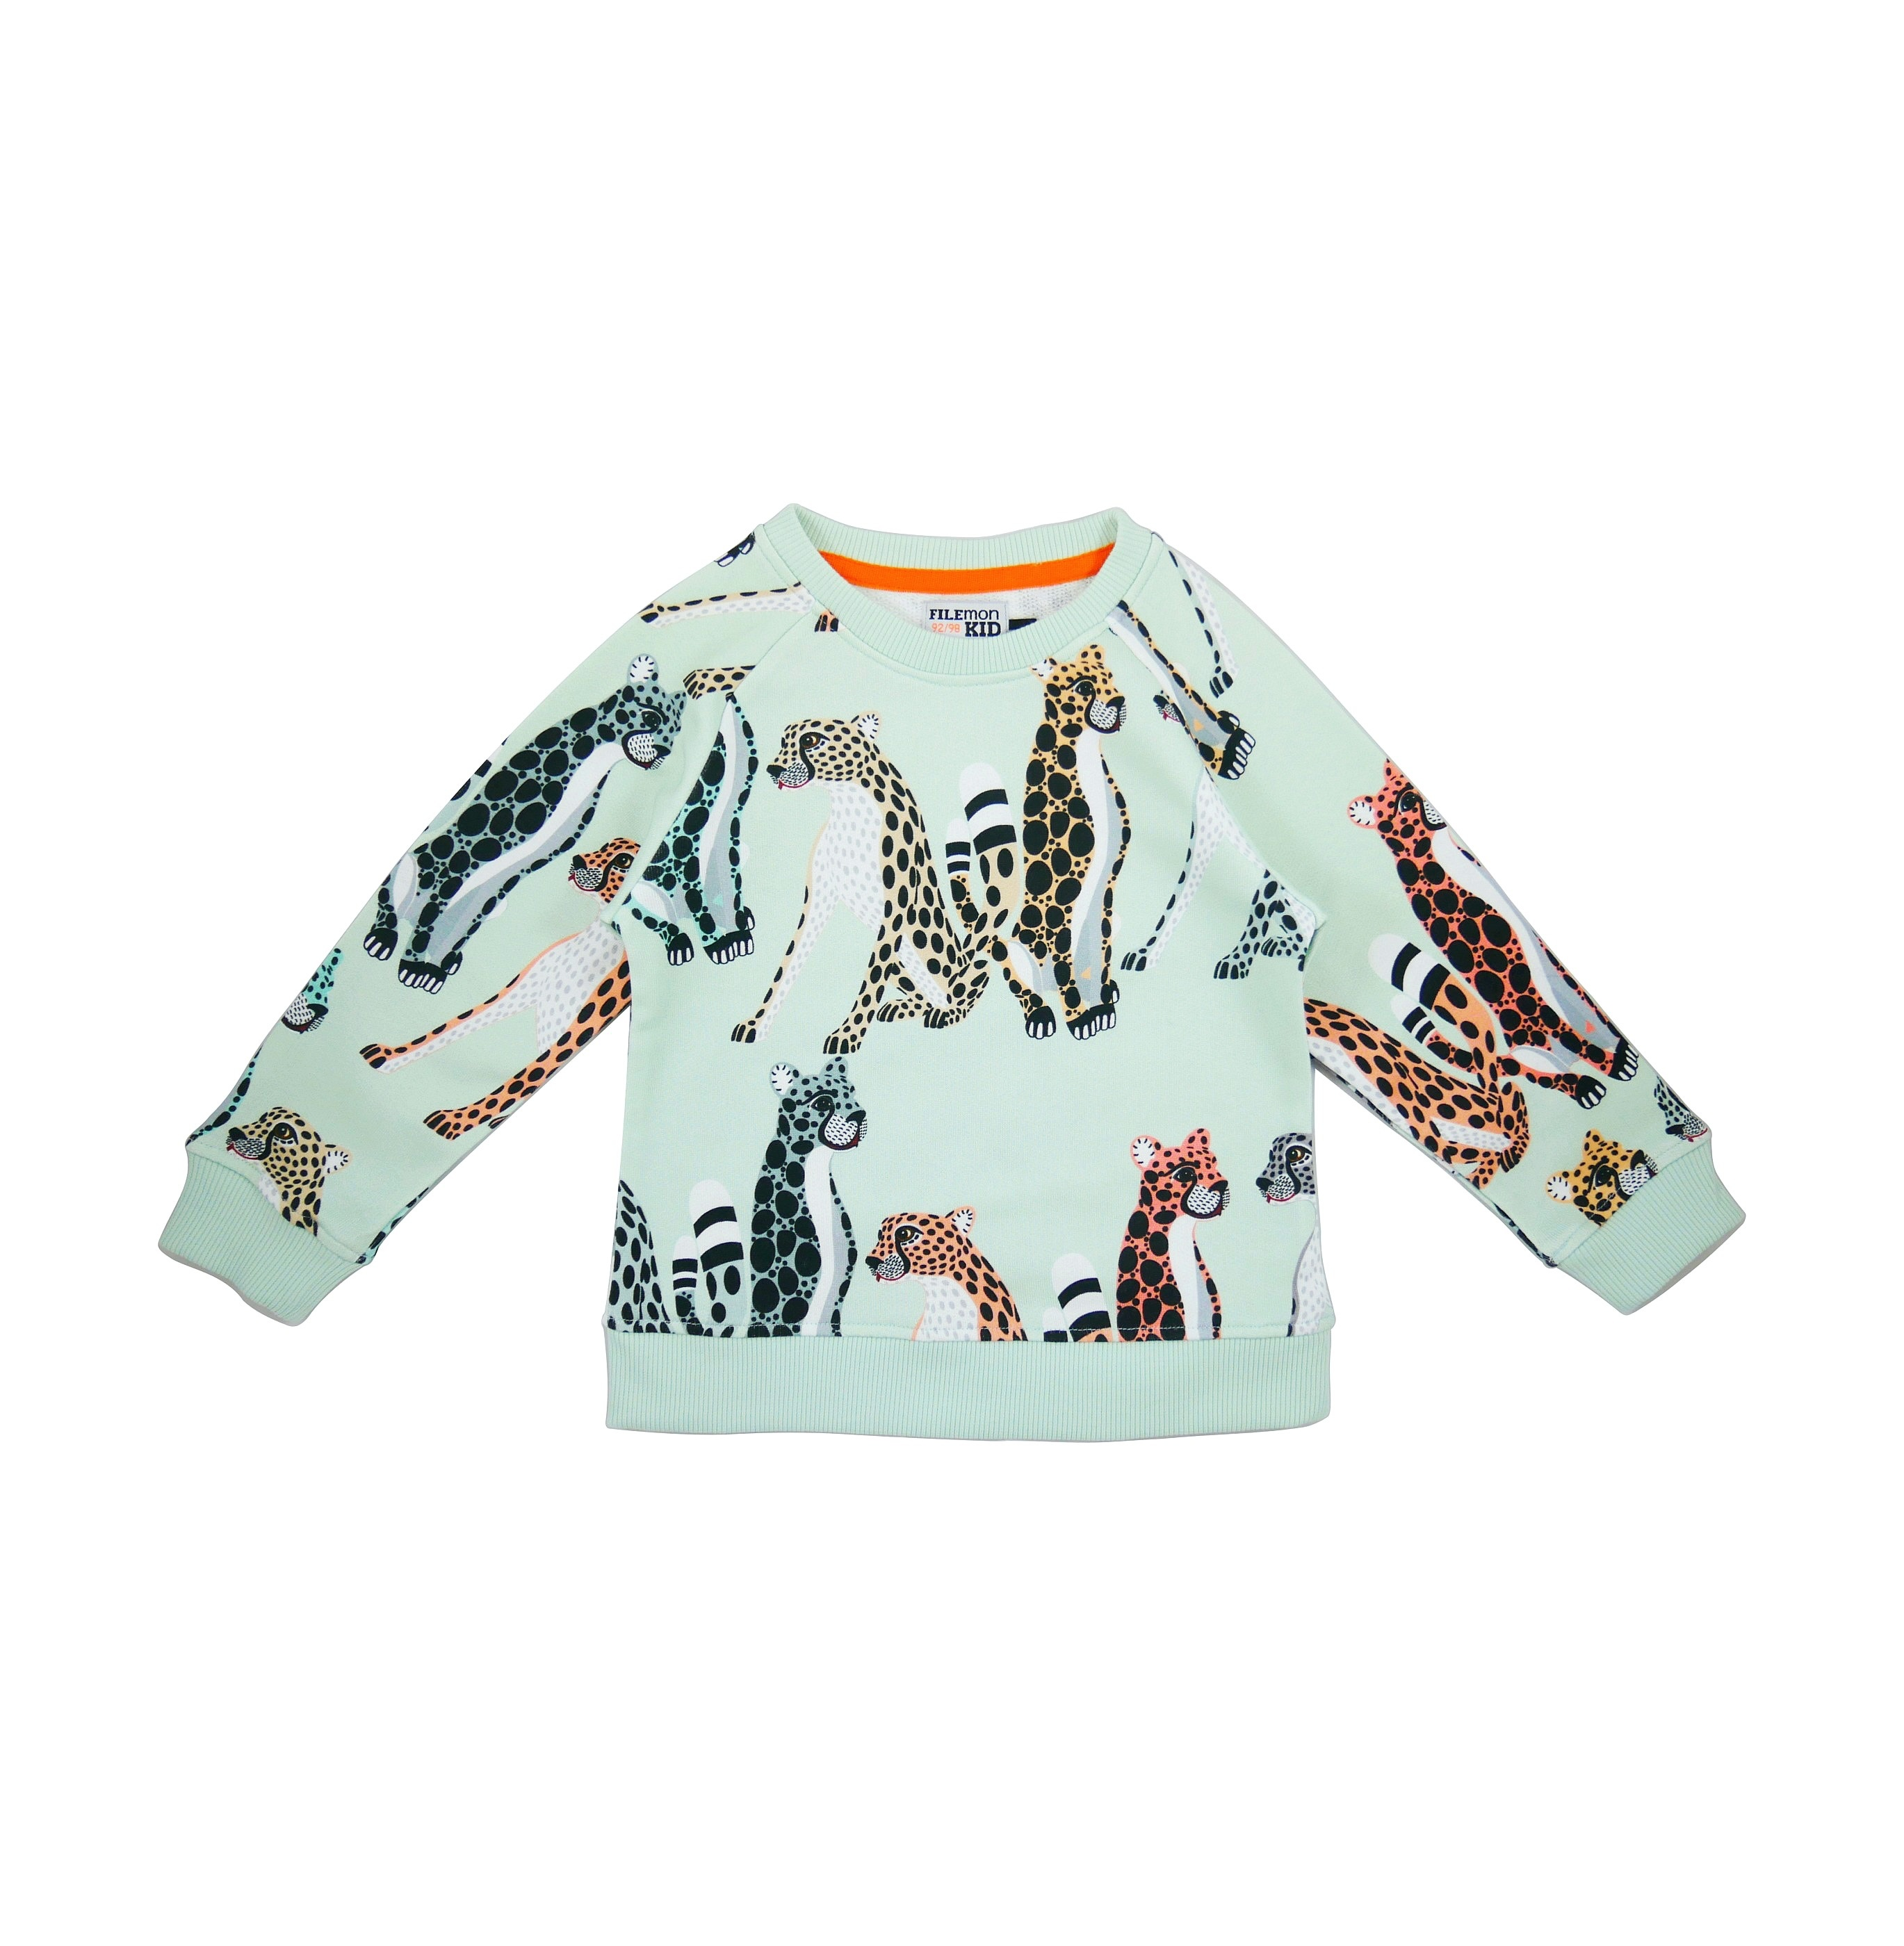 19SSSC Sweatshirt Cheetahs AOP